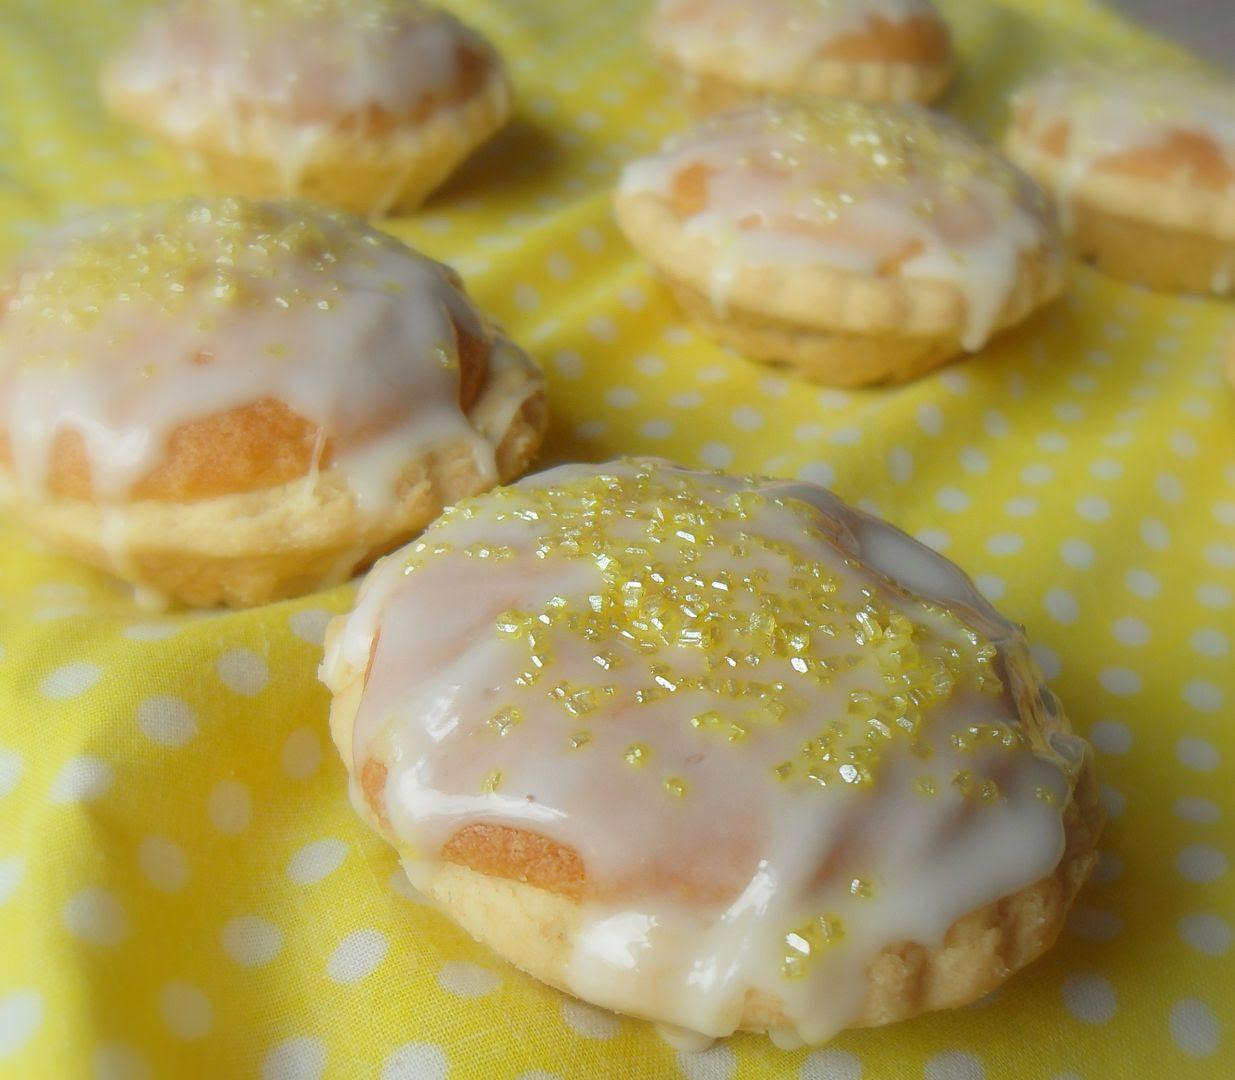 Lemon Drizzle Tarts